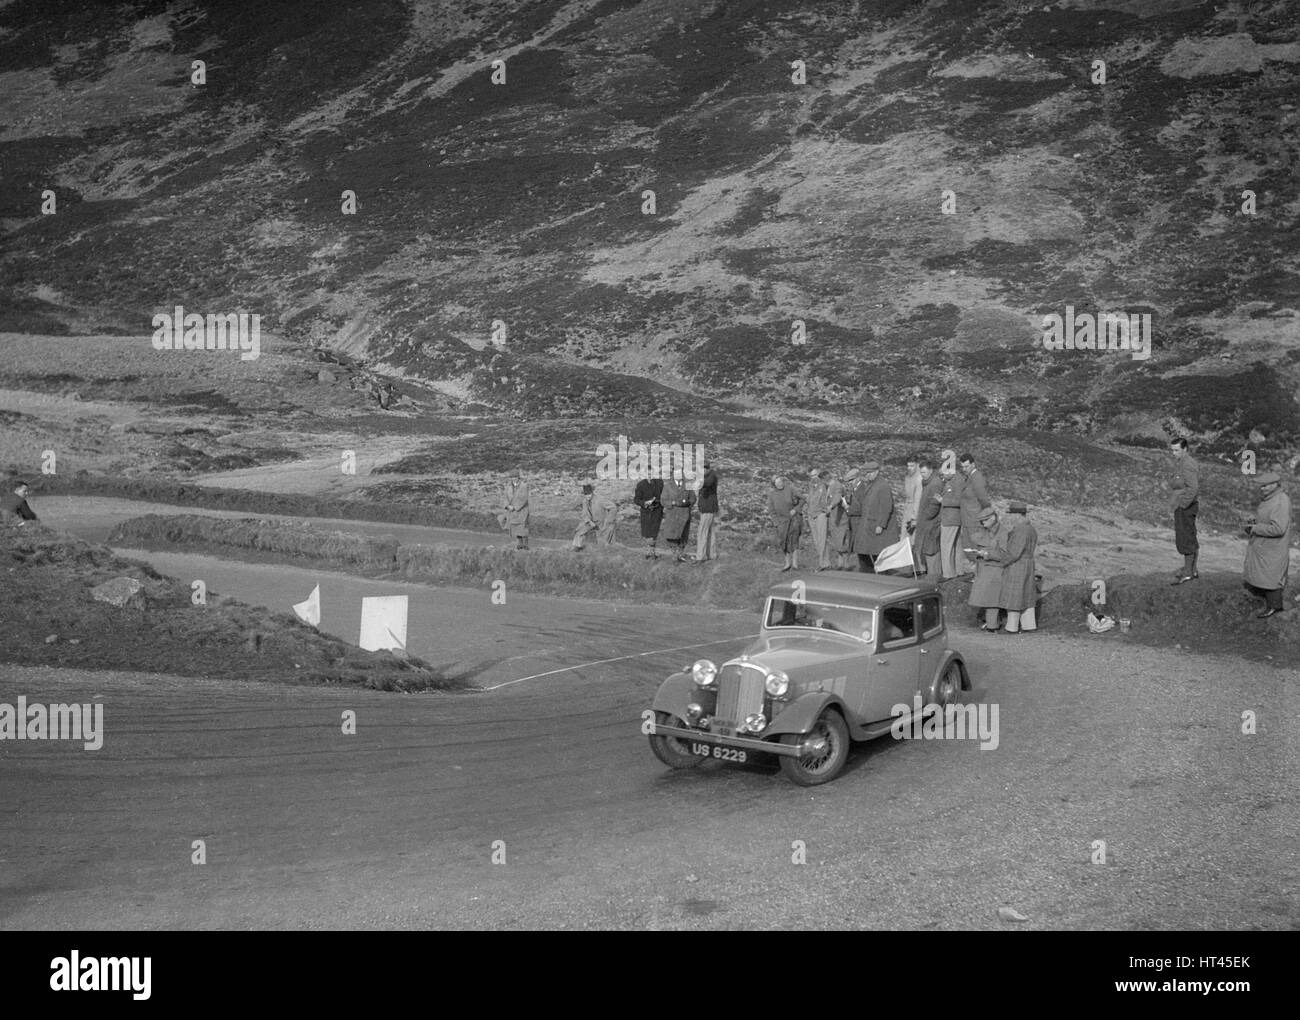 Rover saloon of J Gibbon Jr at the RSAC Scottish Rally, Devil's Elbow, Glenshee, 1934. Artist: Bill Brunell. - Stock Image